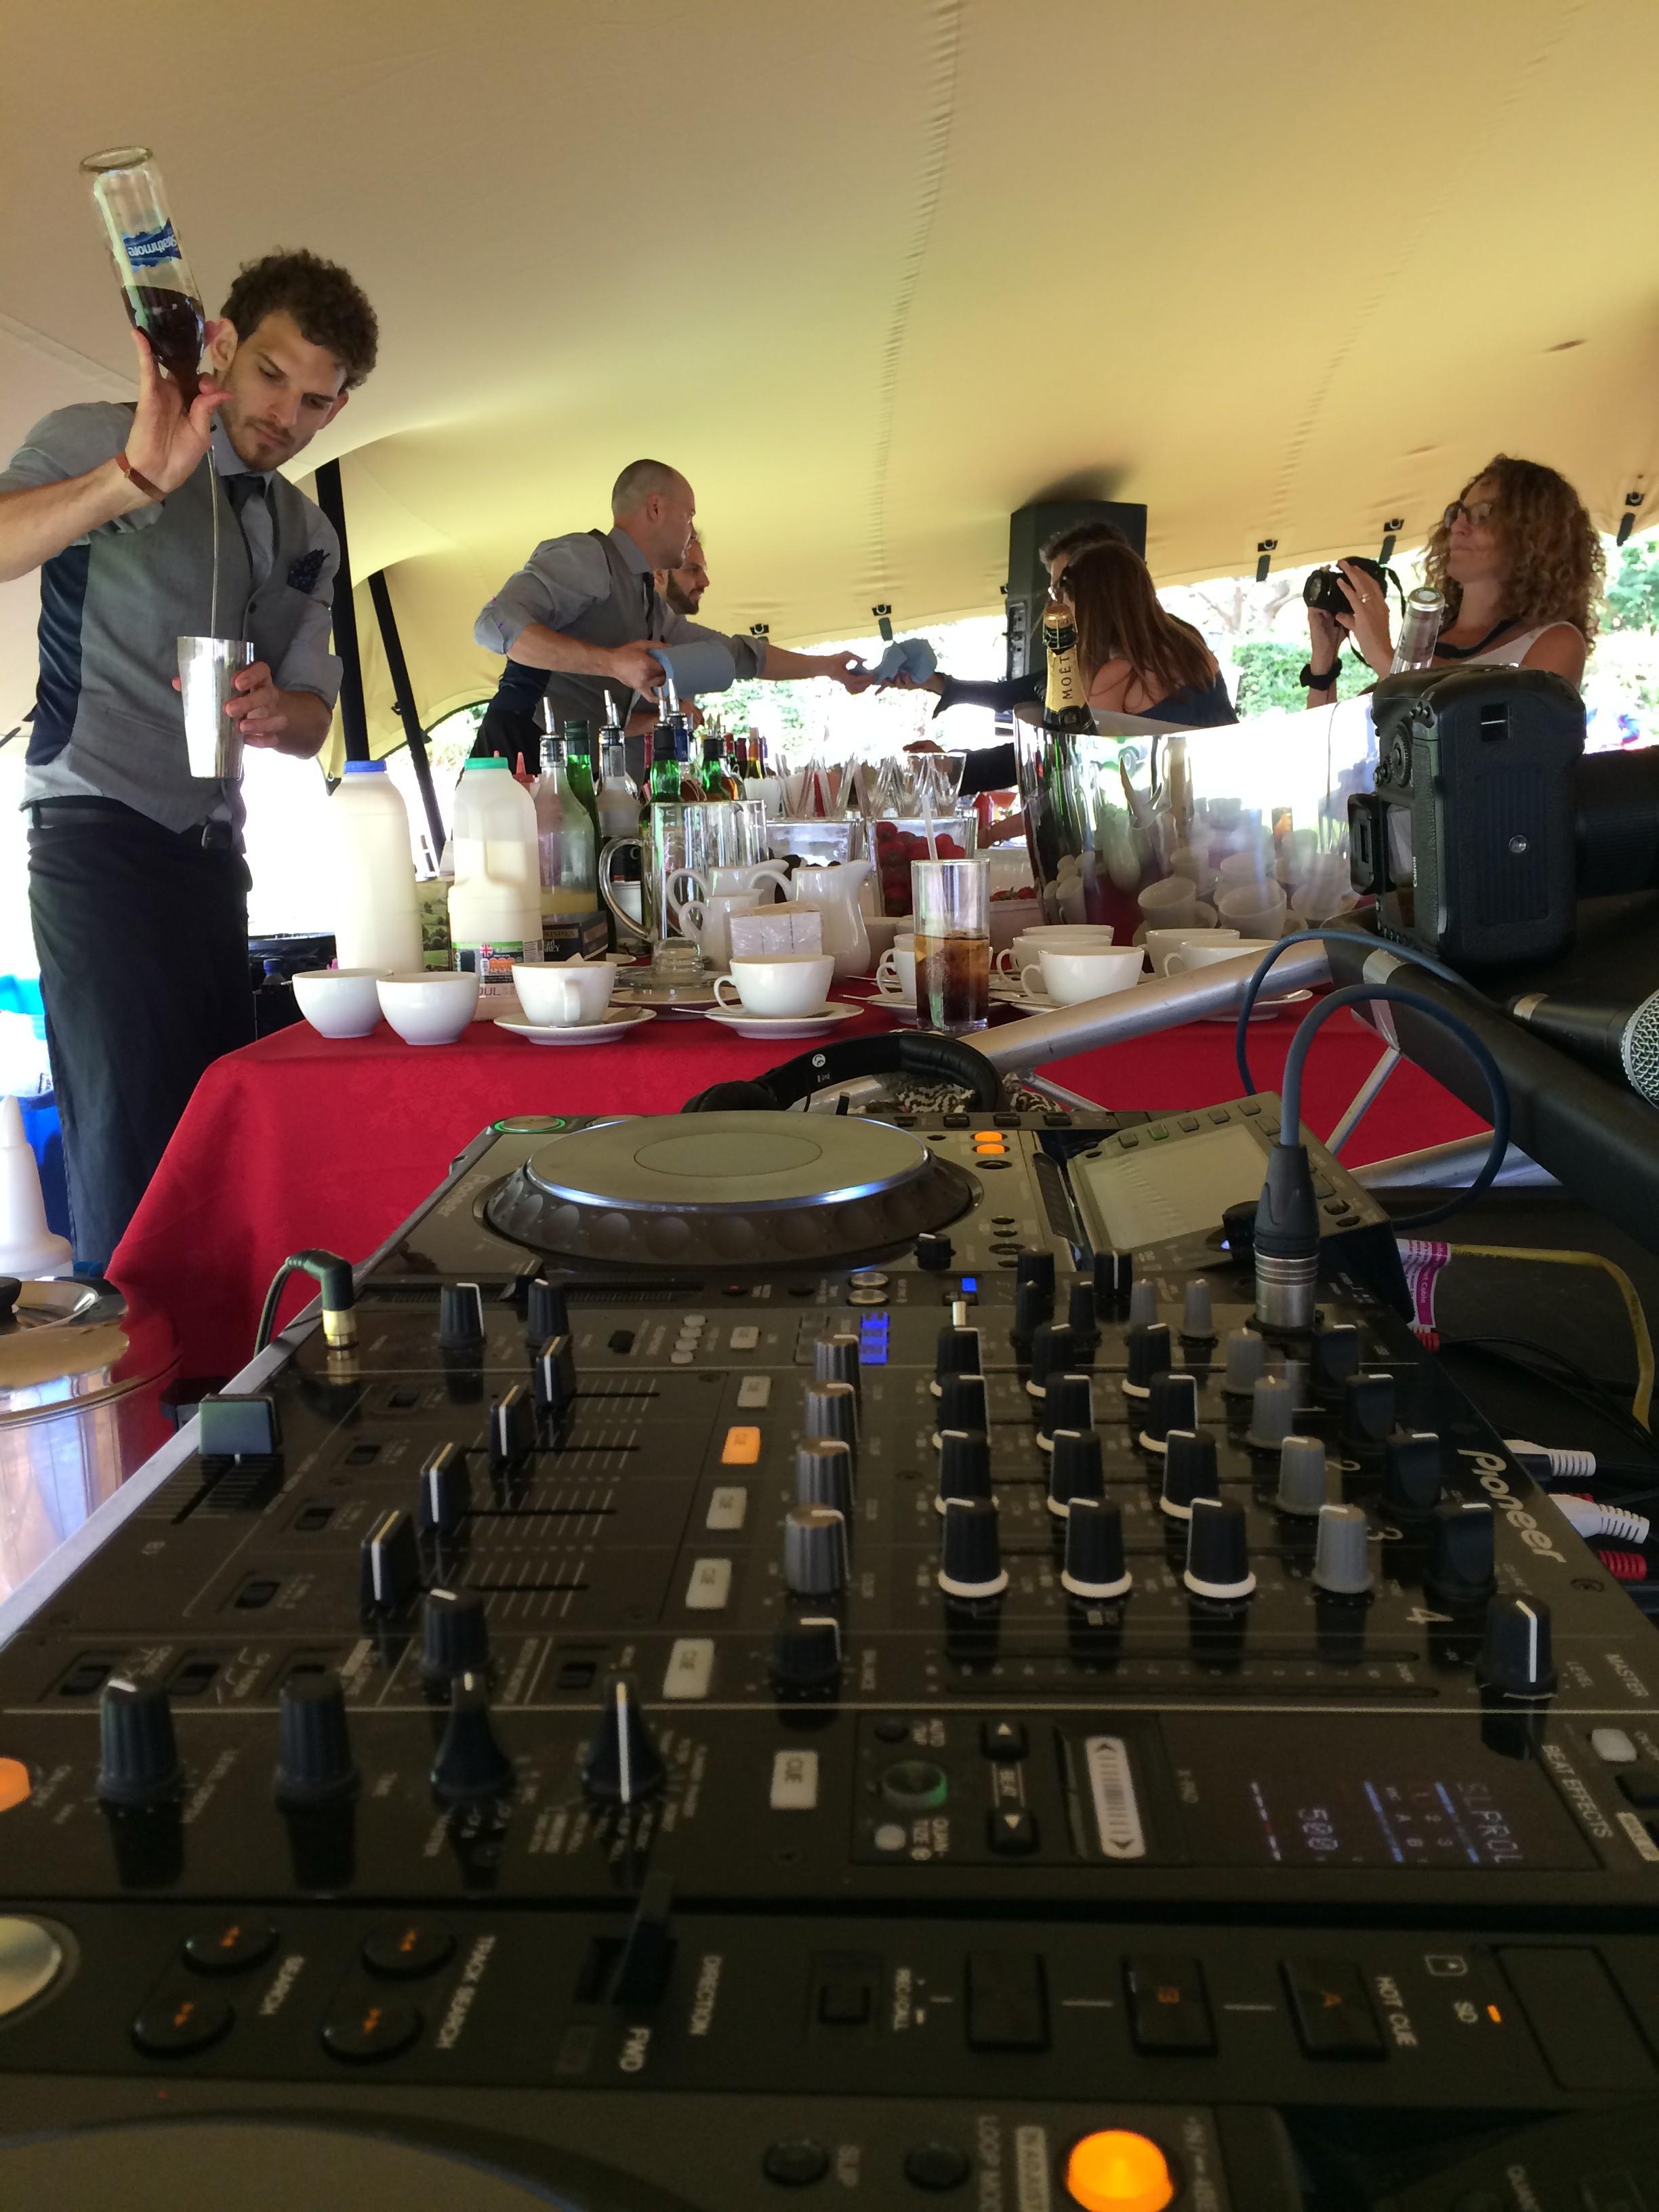 Wilderness Road Chislehurst Street Party – 29/6/2014